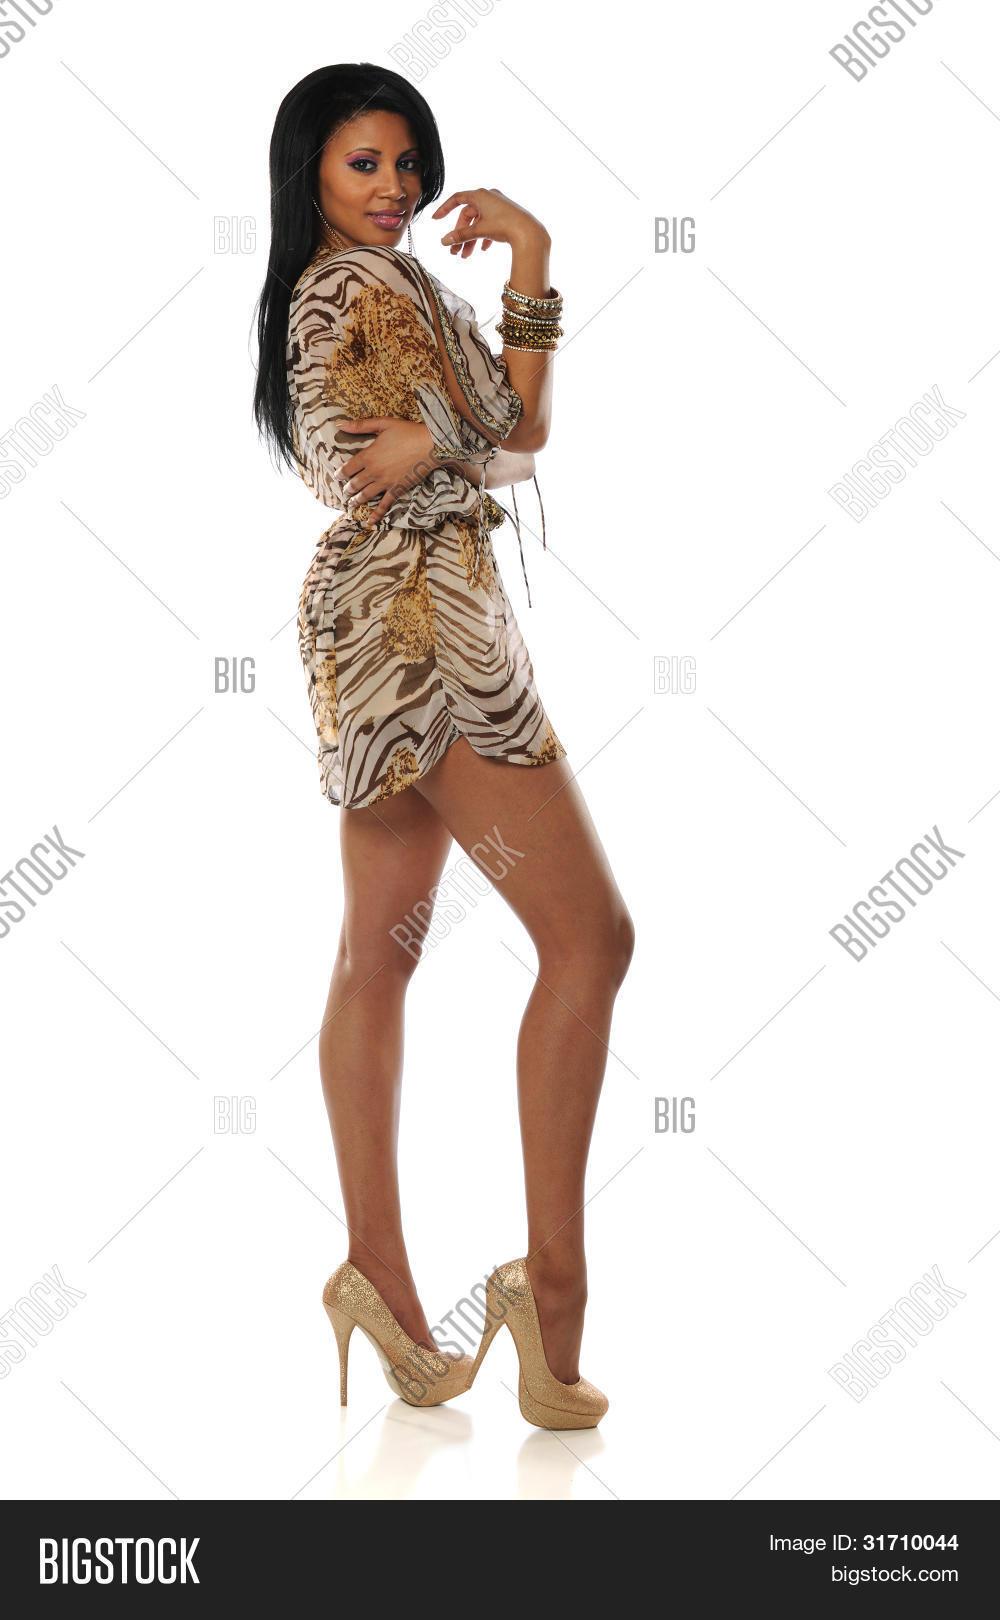 Beautiful African American Woman Wearing A Short Dress And High Heels